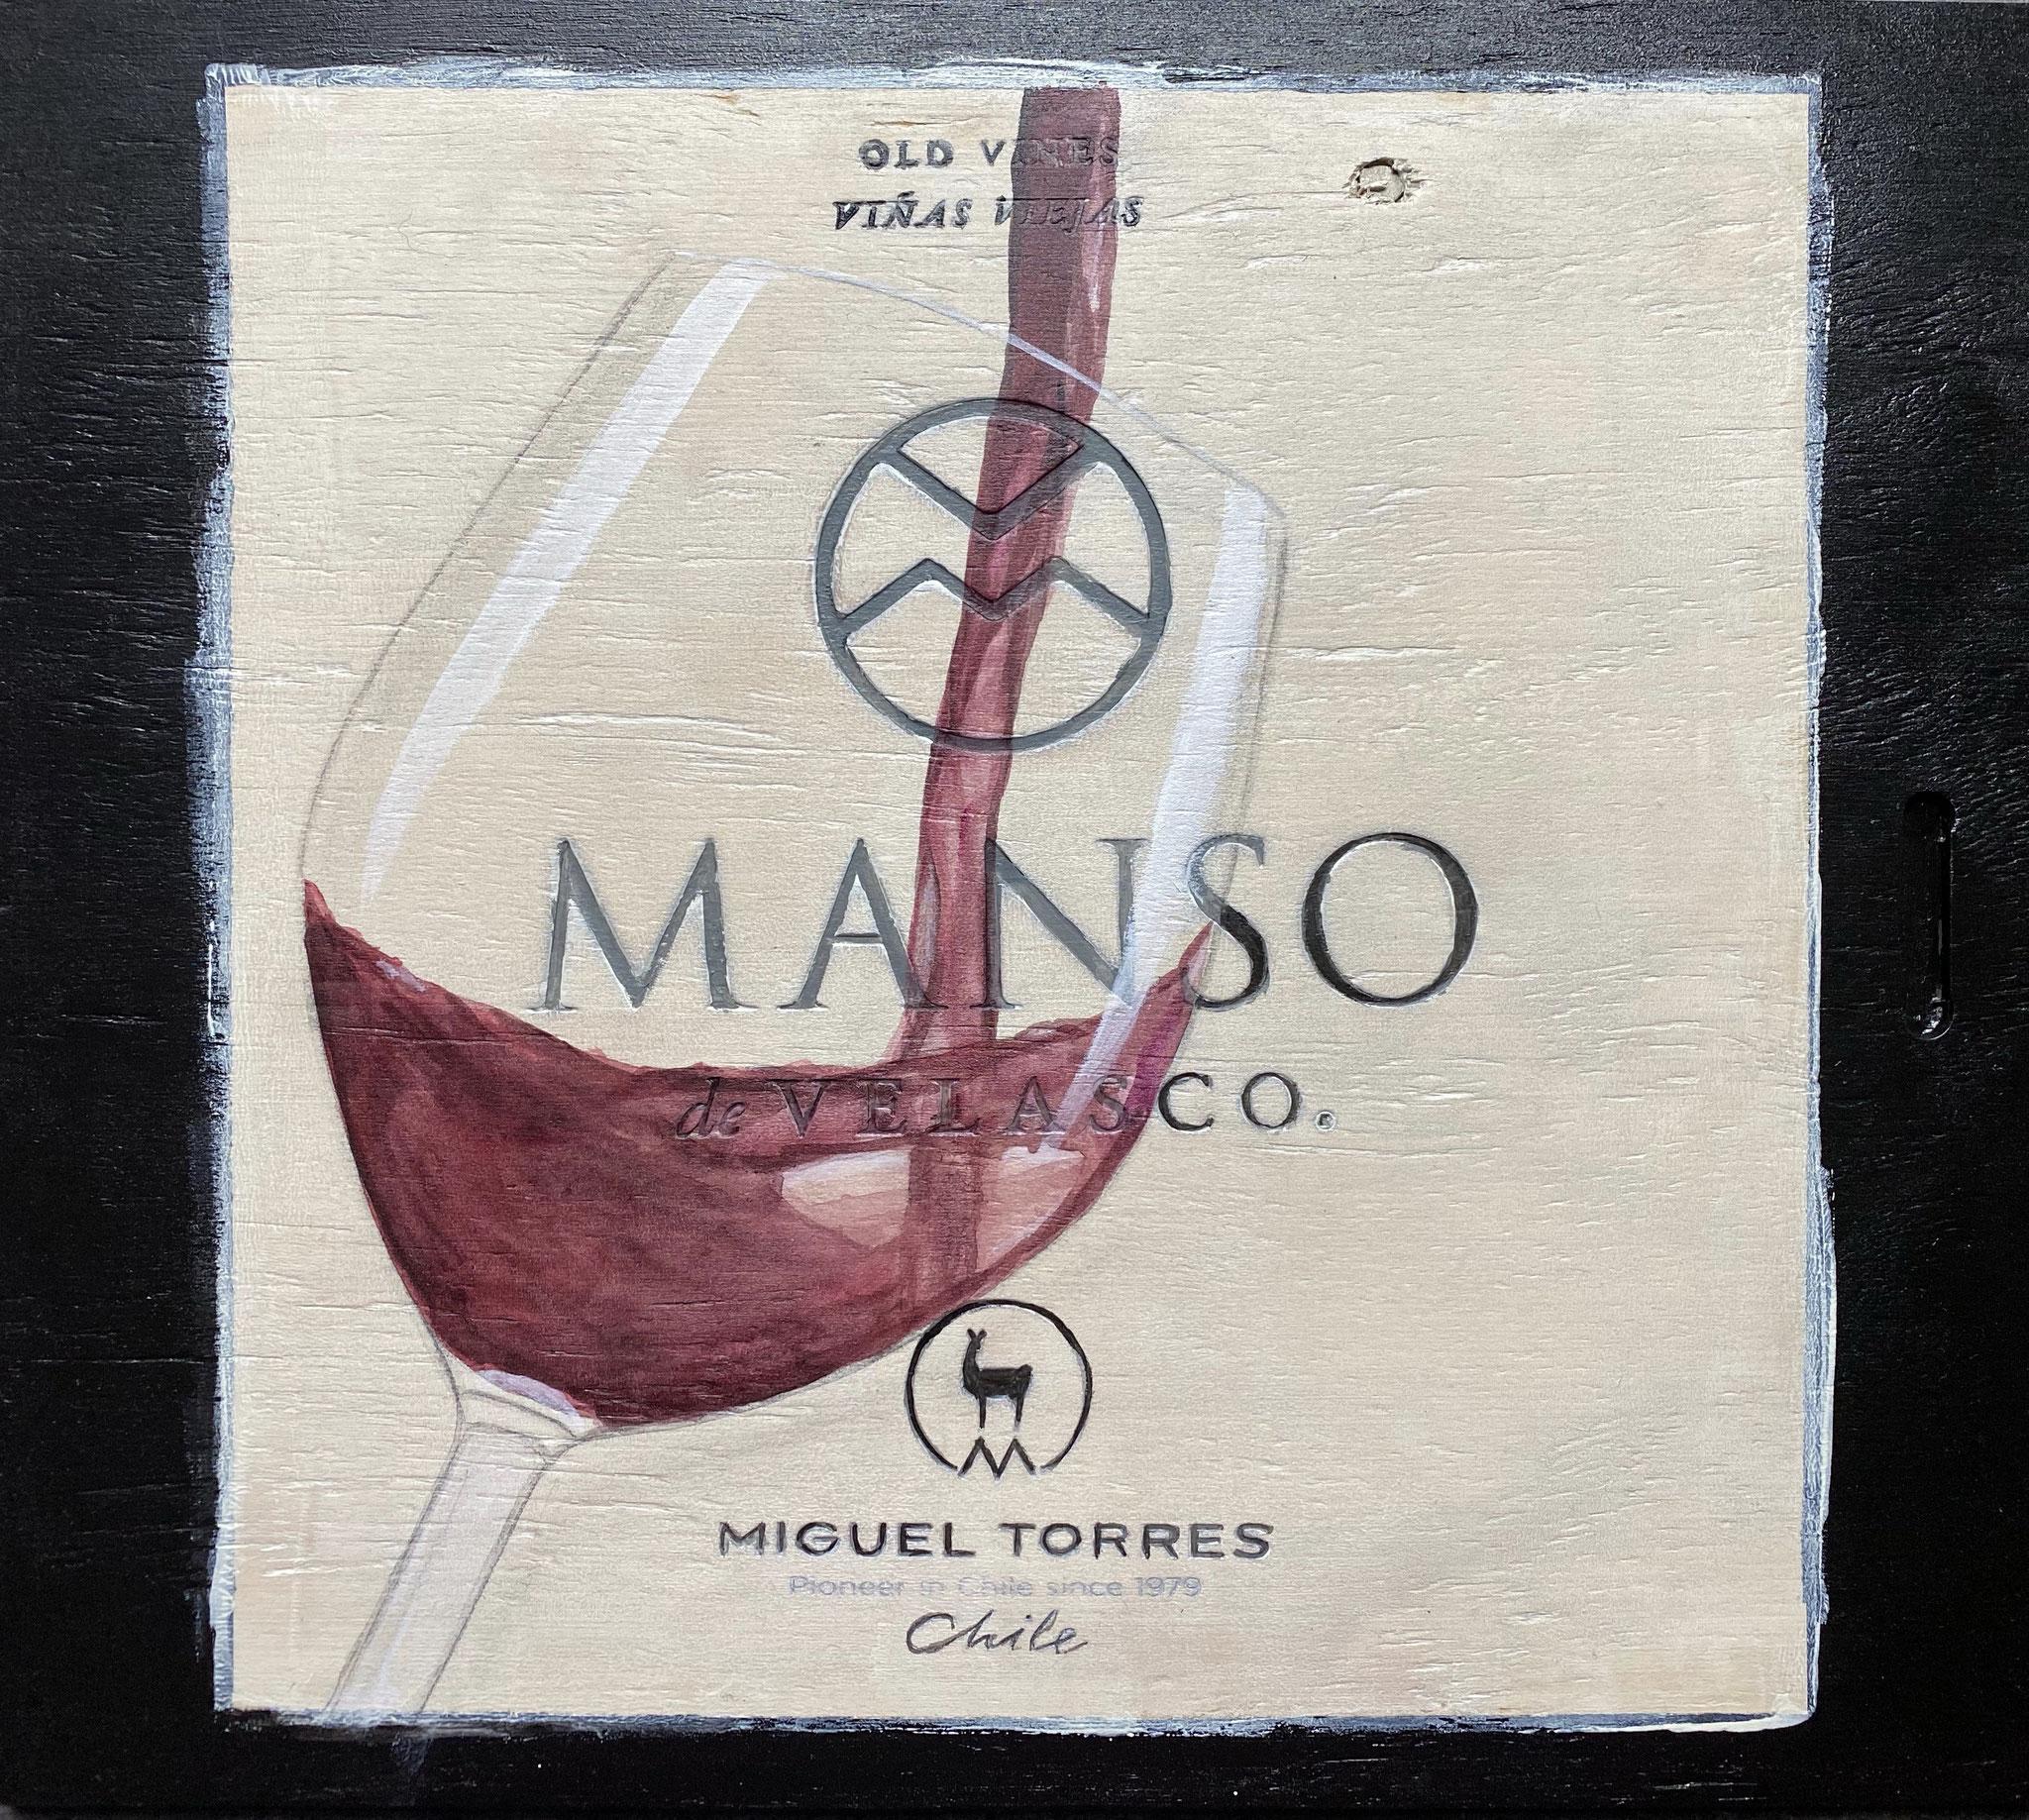 Manso de Velasco